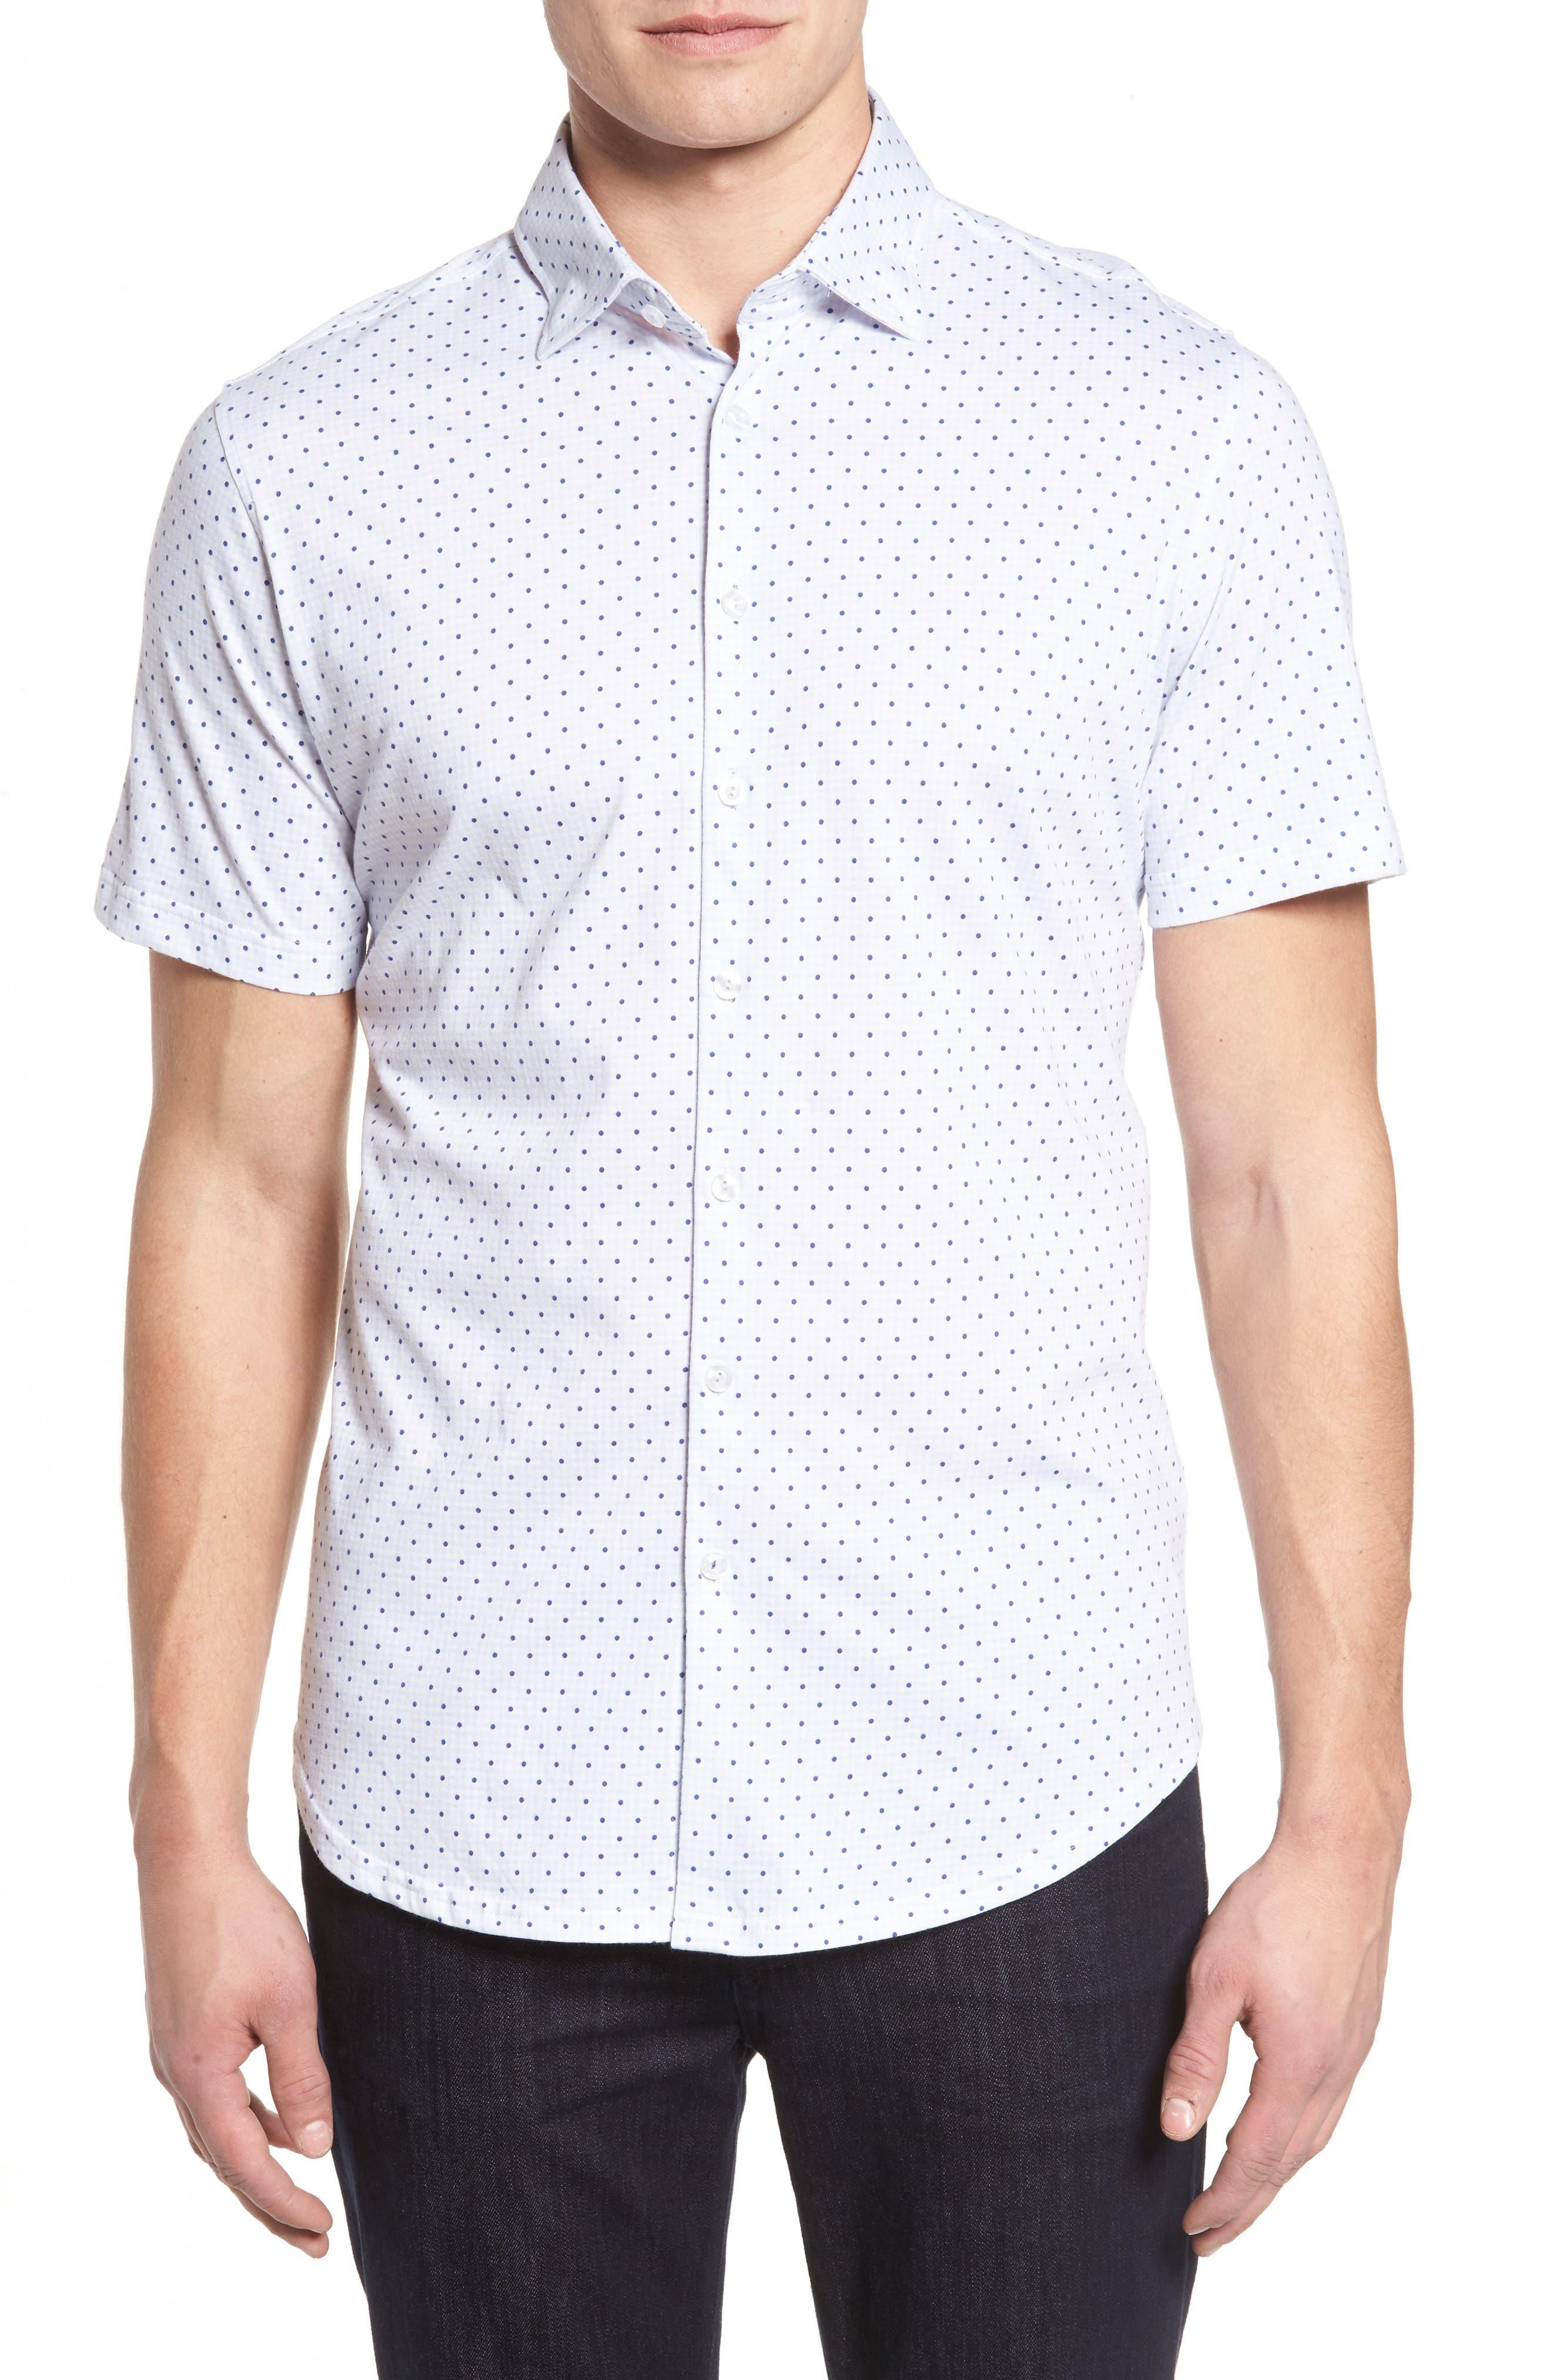 Trim Fit Polka Dot Check Sport Shirt,                             Main thumbnail 1, color,                             020